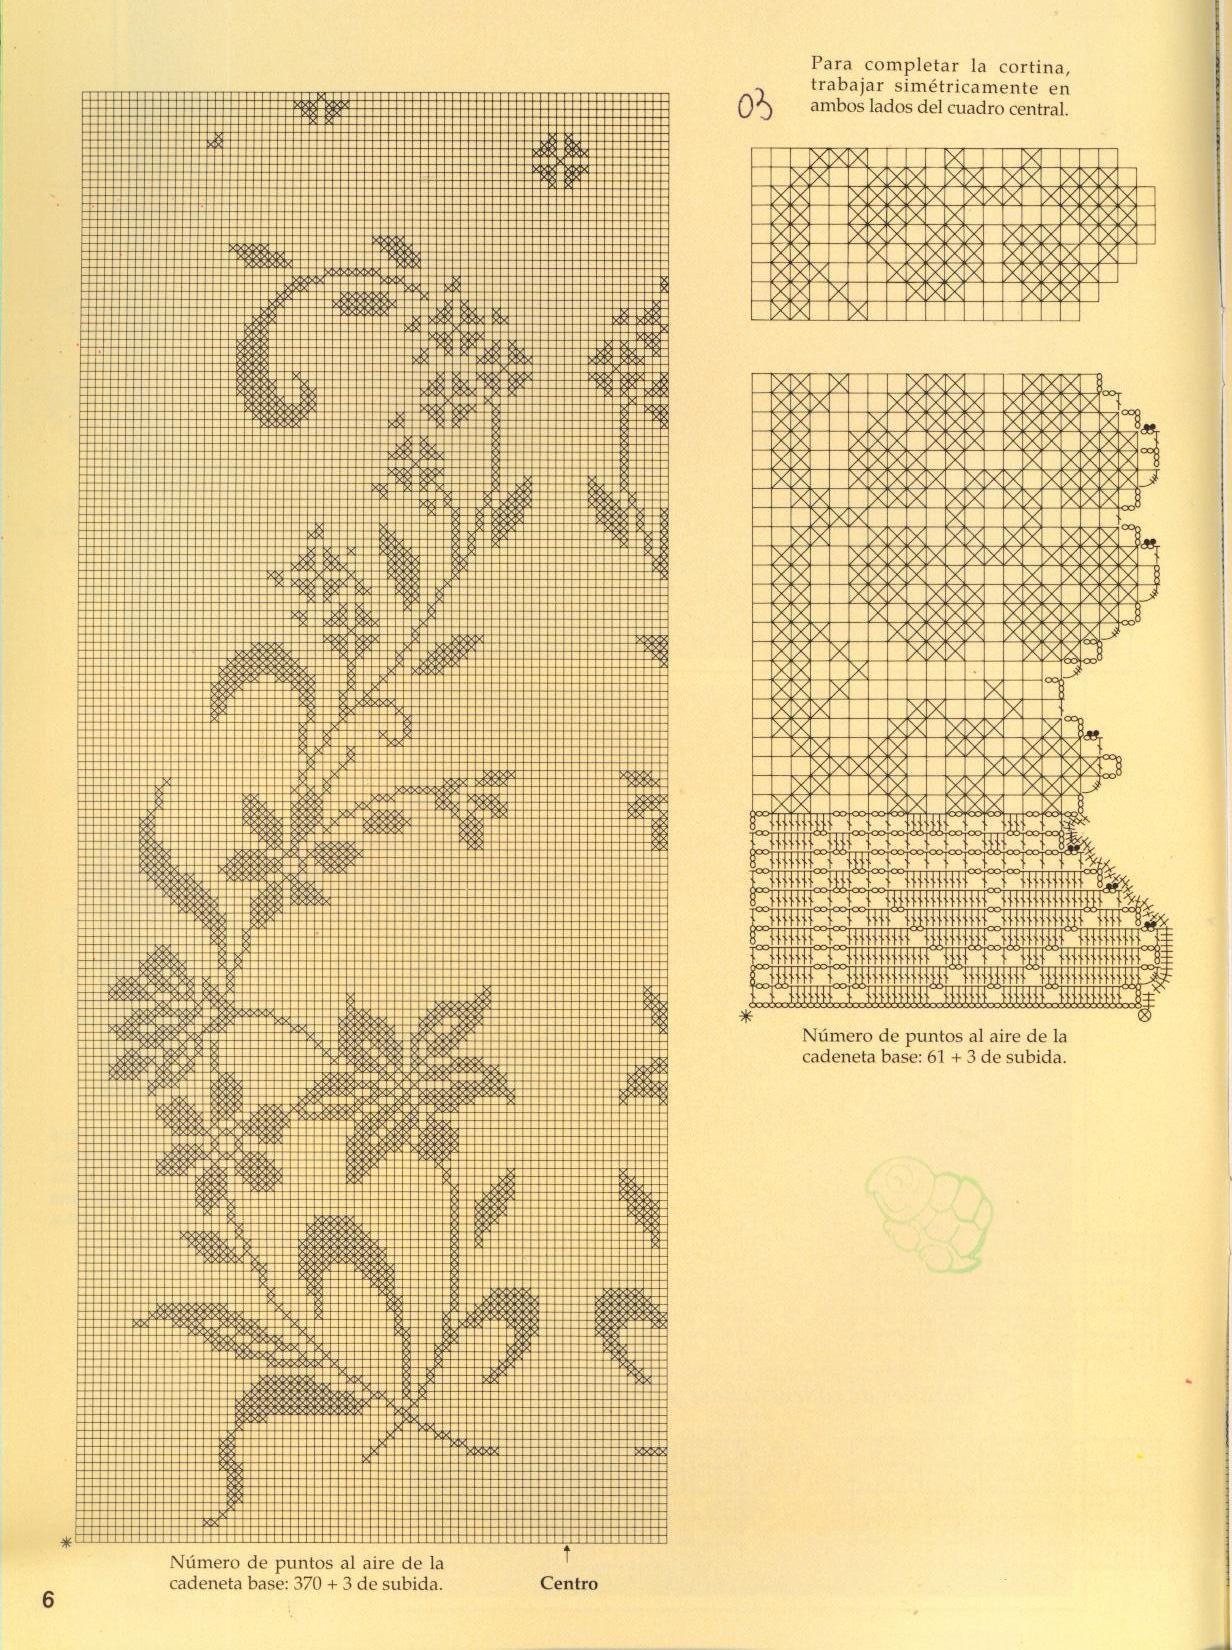 Green curtains crossword - Imgbox Fast Simple Image Host Crochet Curtainscrosswordfilet